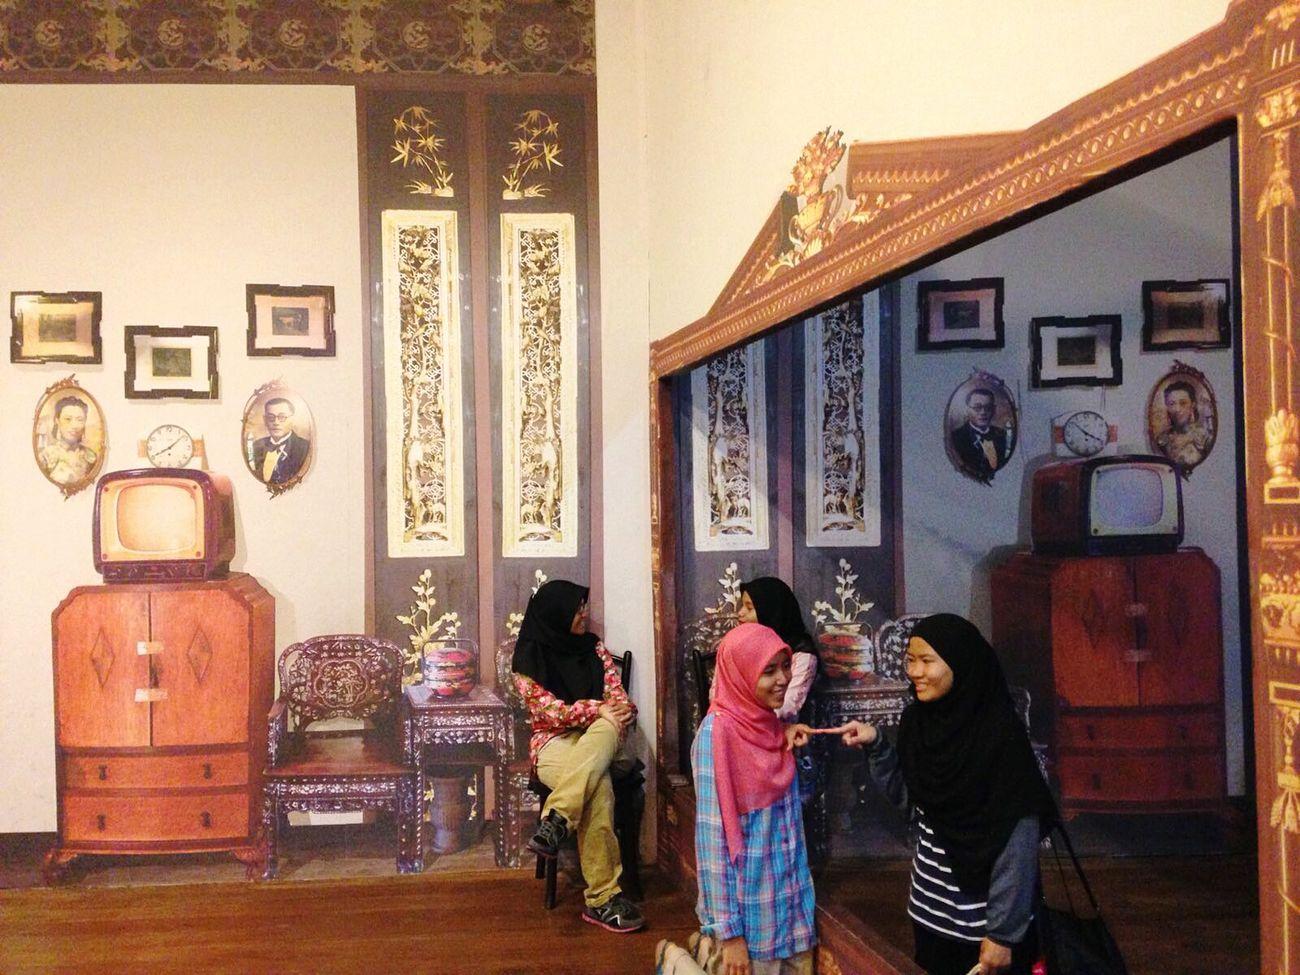 Penang Street Art 🙋🏼 Malaysia Truly Asia Penang Malaysia Penangstreetart Oneofakind Oneofthebest Awesomeart Memories ❤